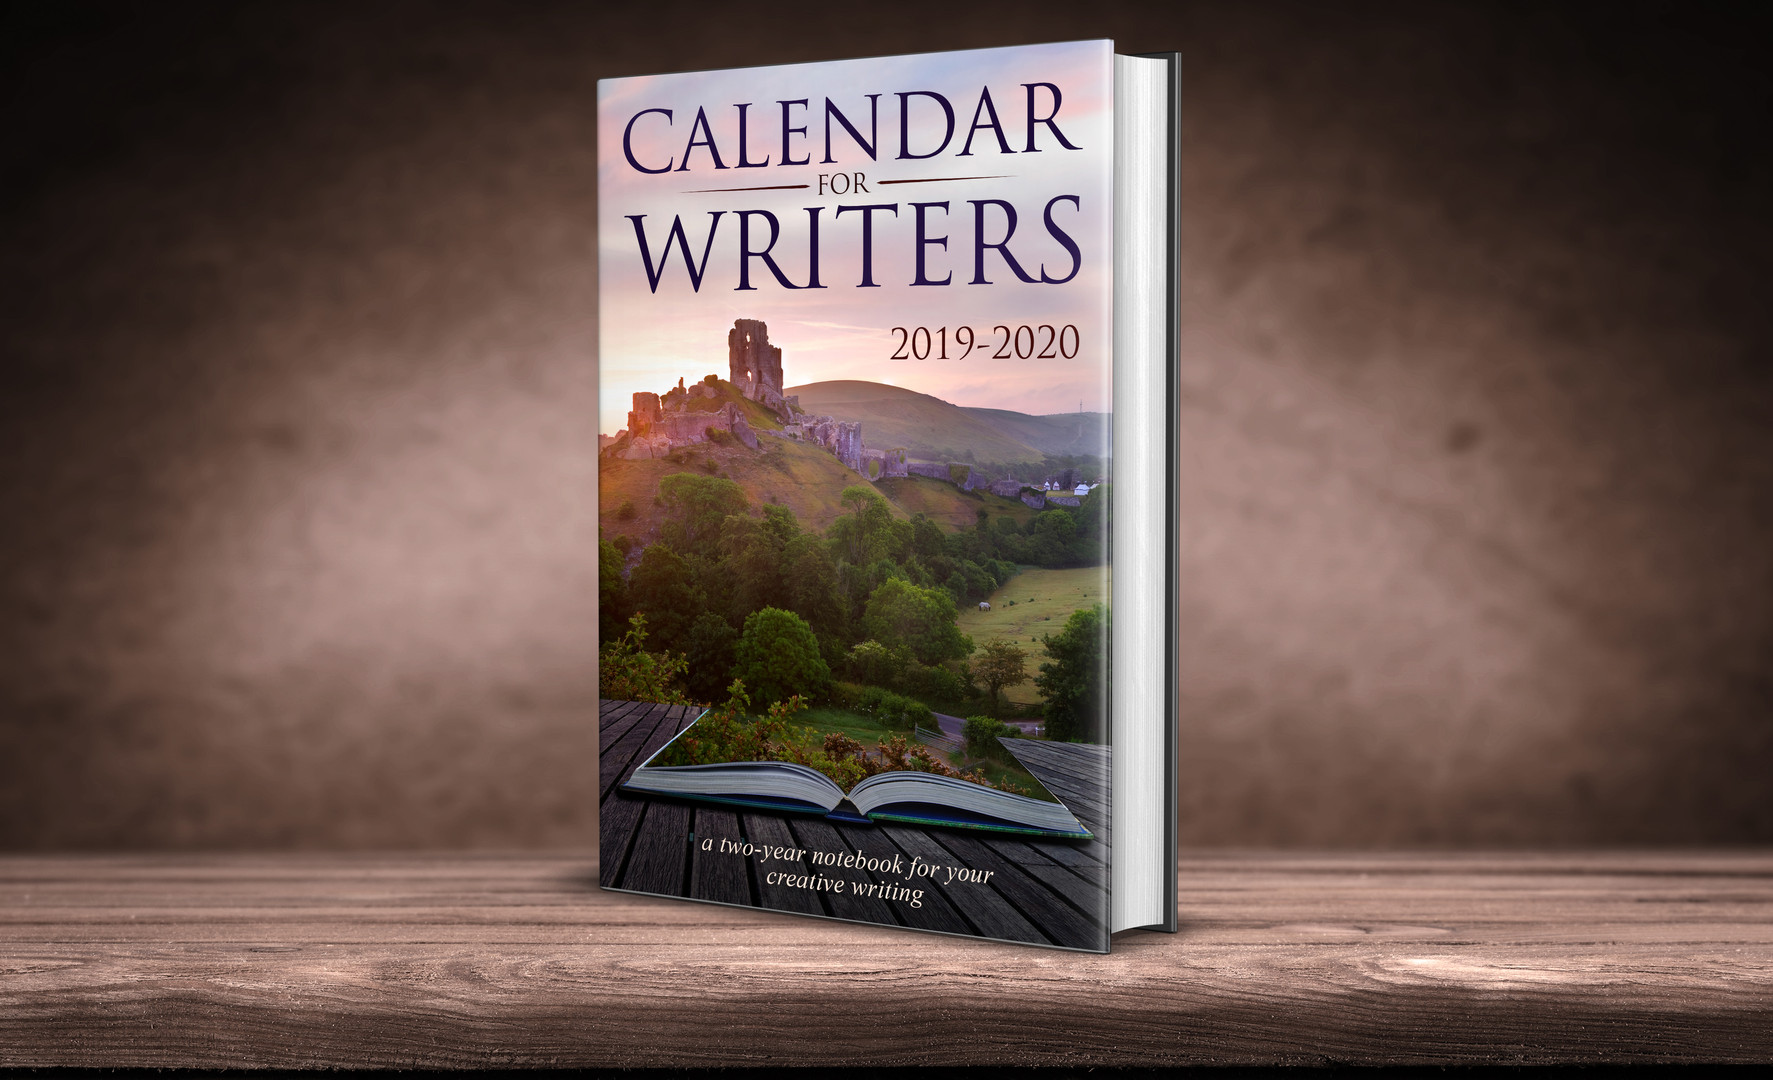 Calendar For Writers 2019-2020 (Ingram Edition)